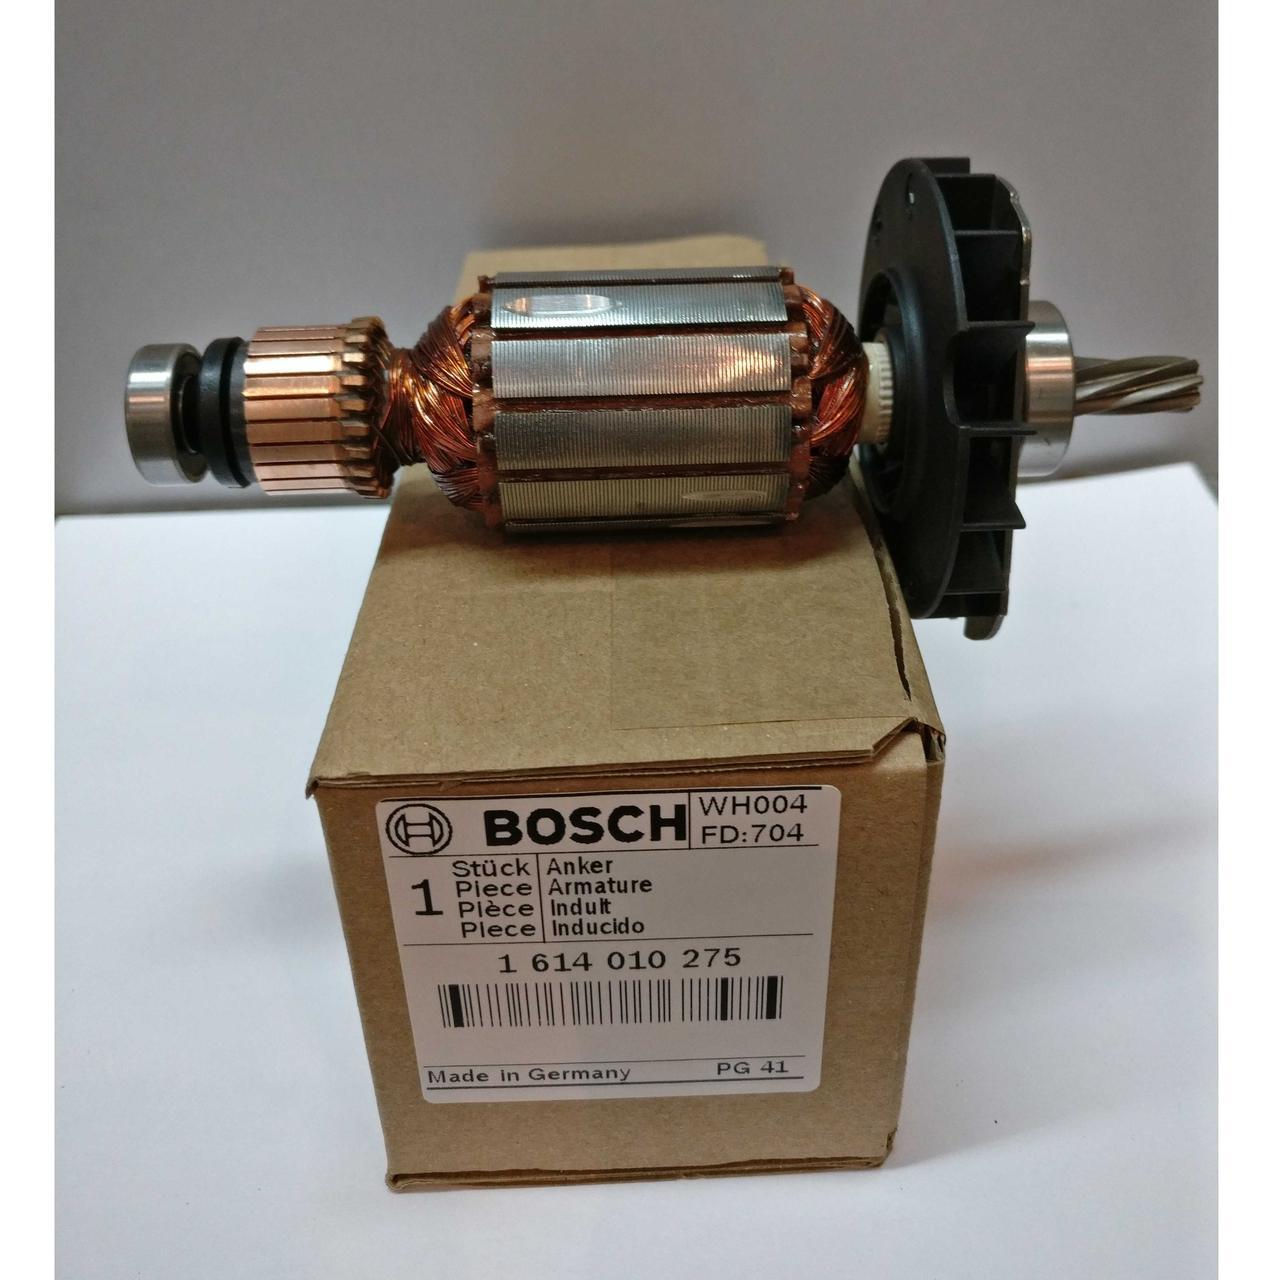 Якорь перфоратор Bosch 2-24DF оригинал 1614010275 ( 144*35 7-з лево)